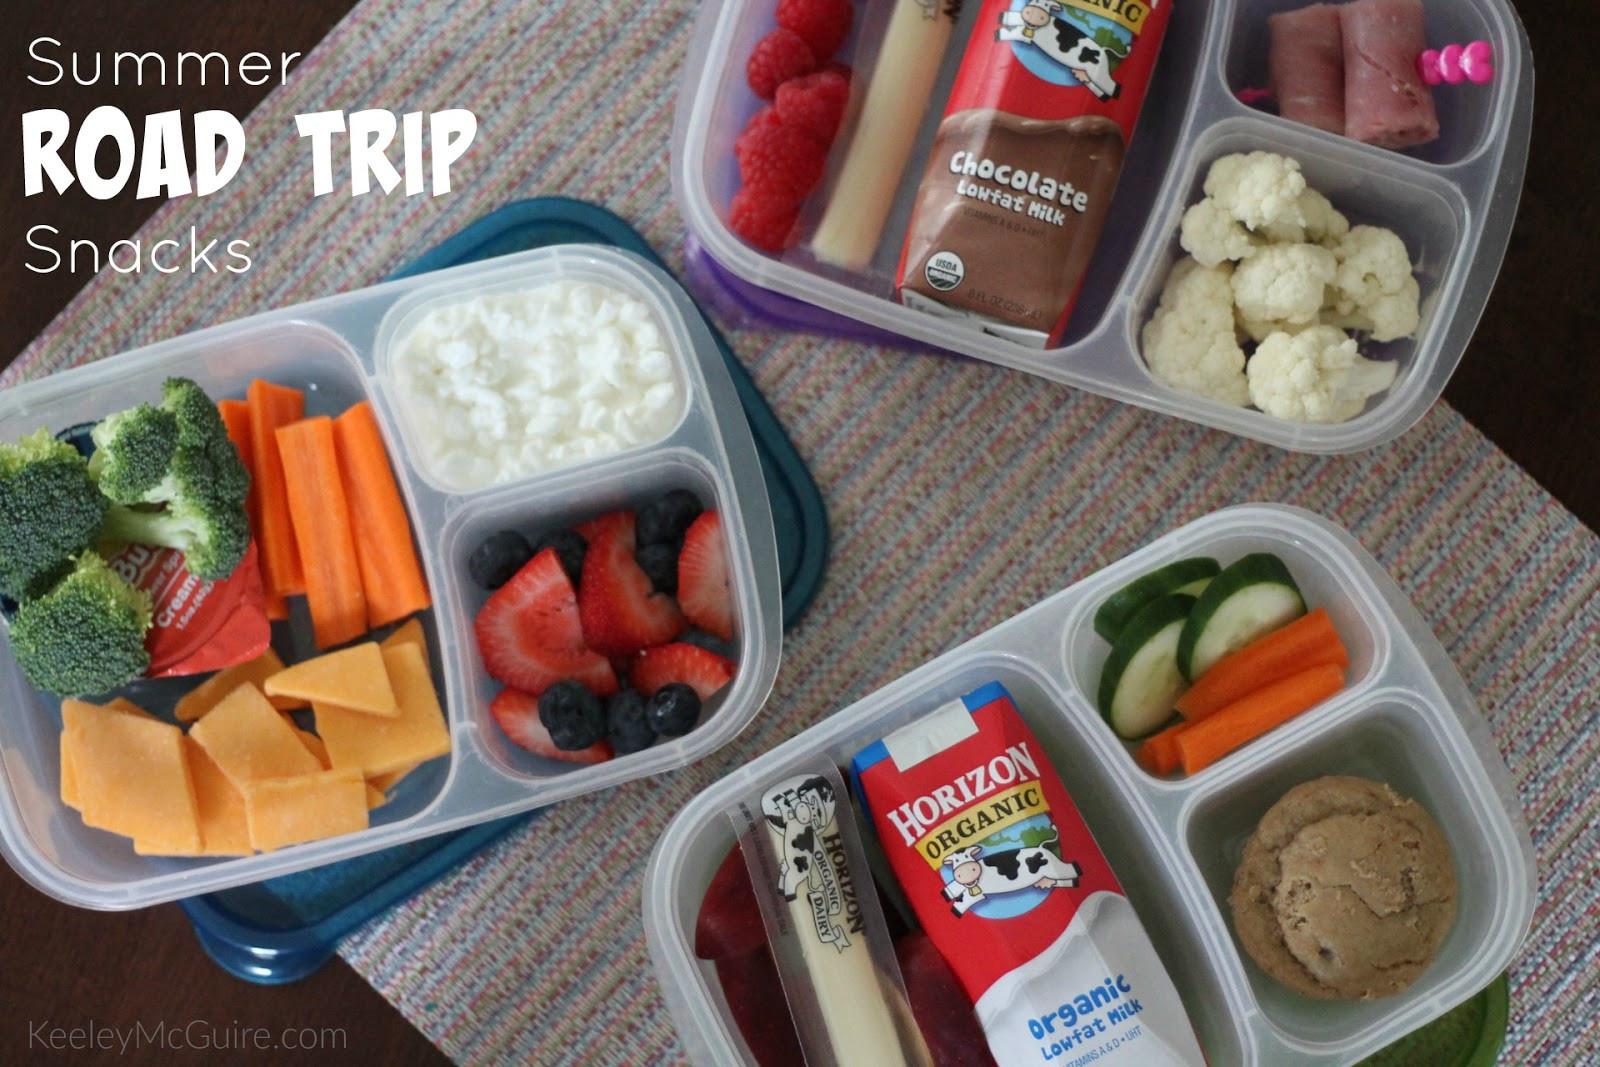 Healthy Road Trip Snacks  Gluten Free & Allergy Friendly Easy Summer Road Trip